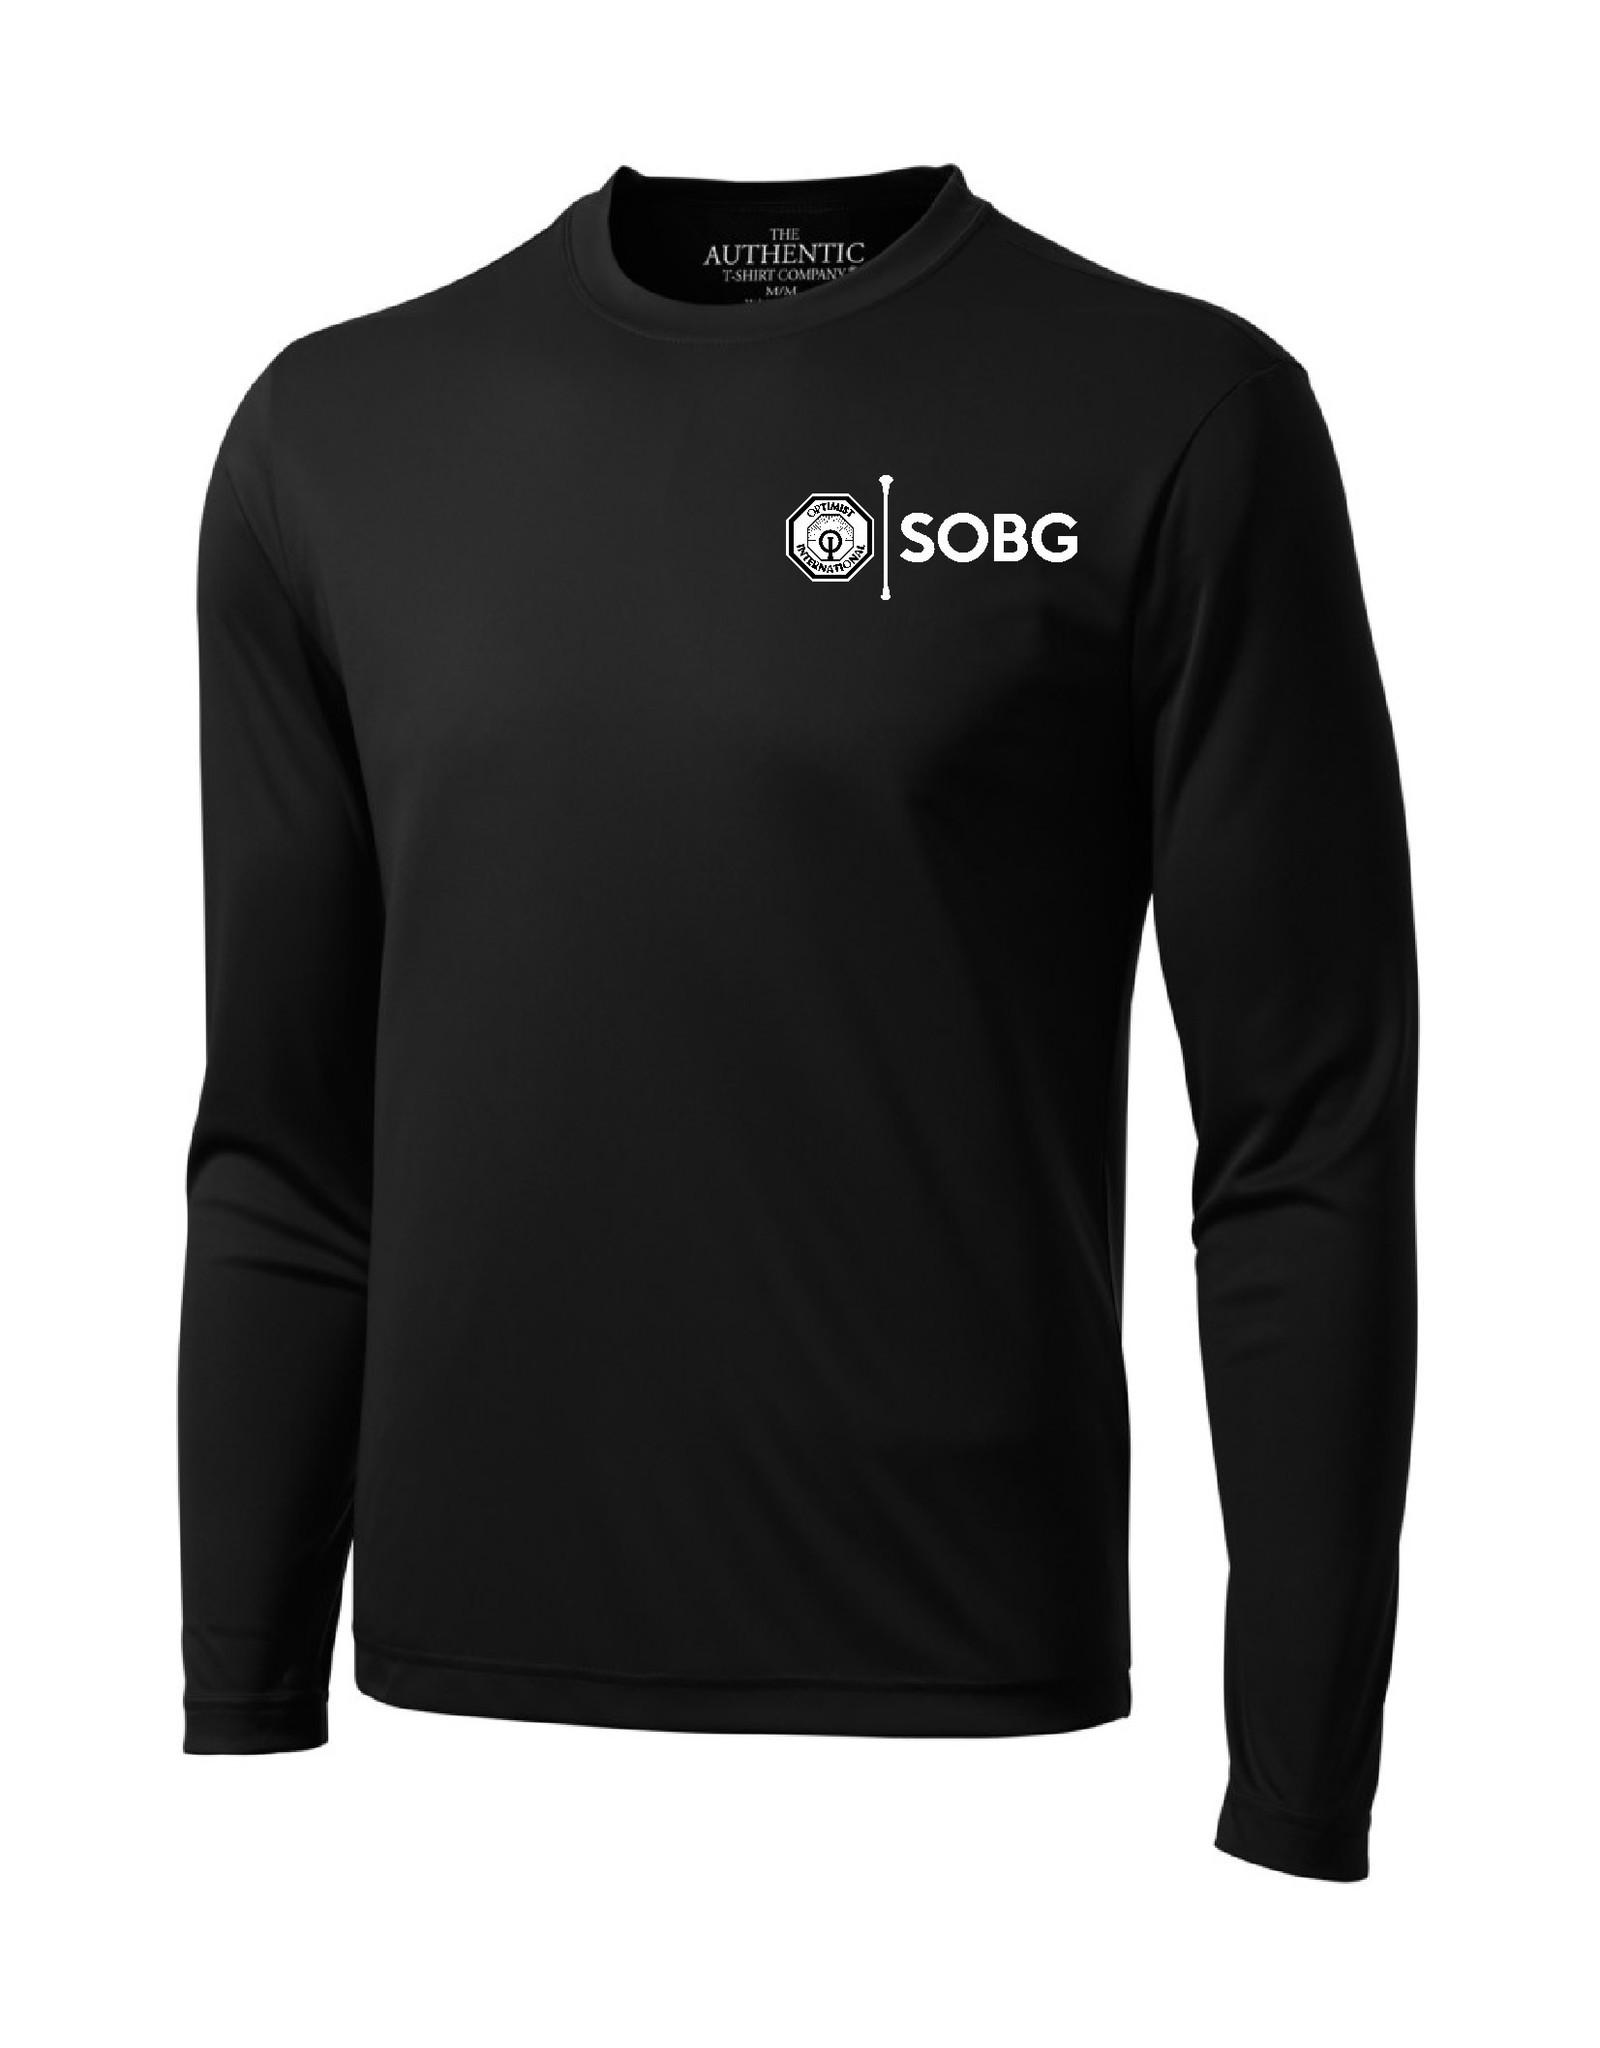 SOBG Performance Long Sleeve